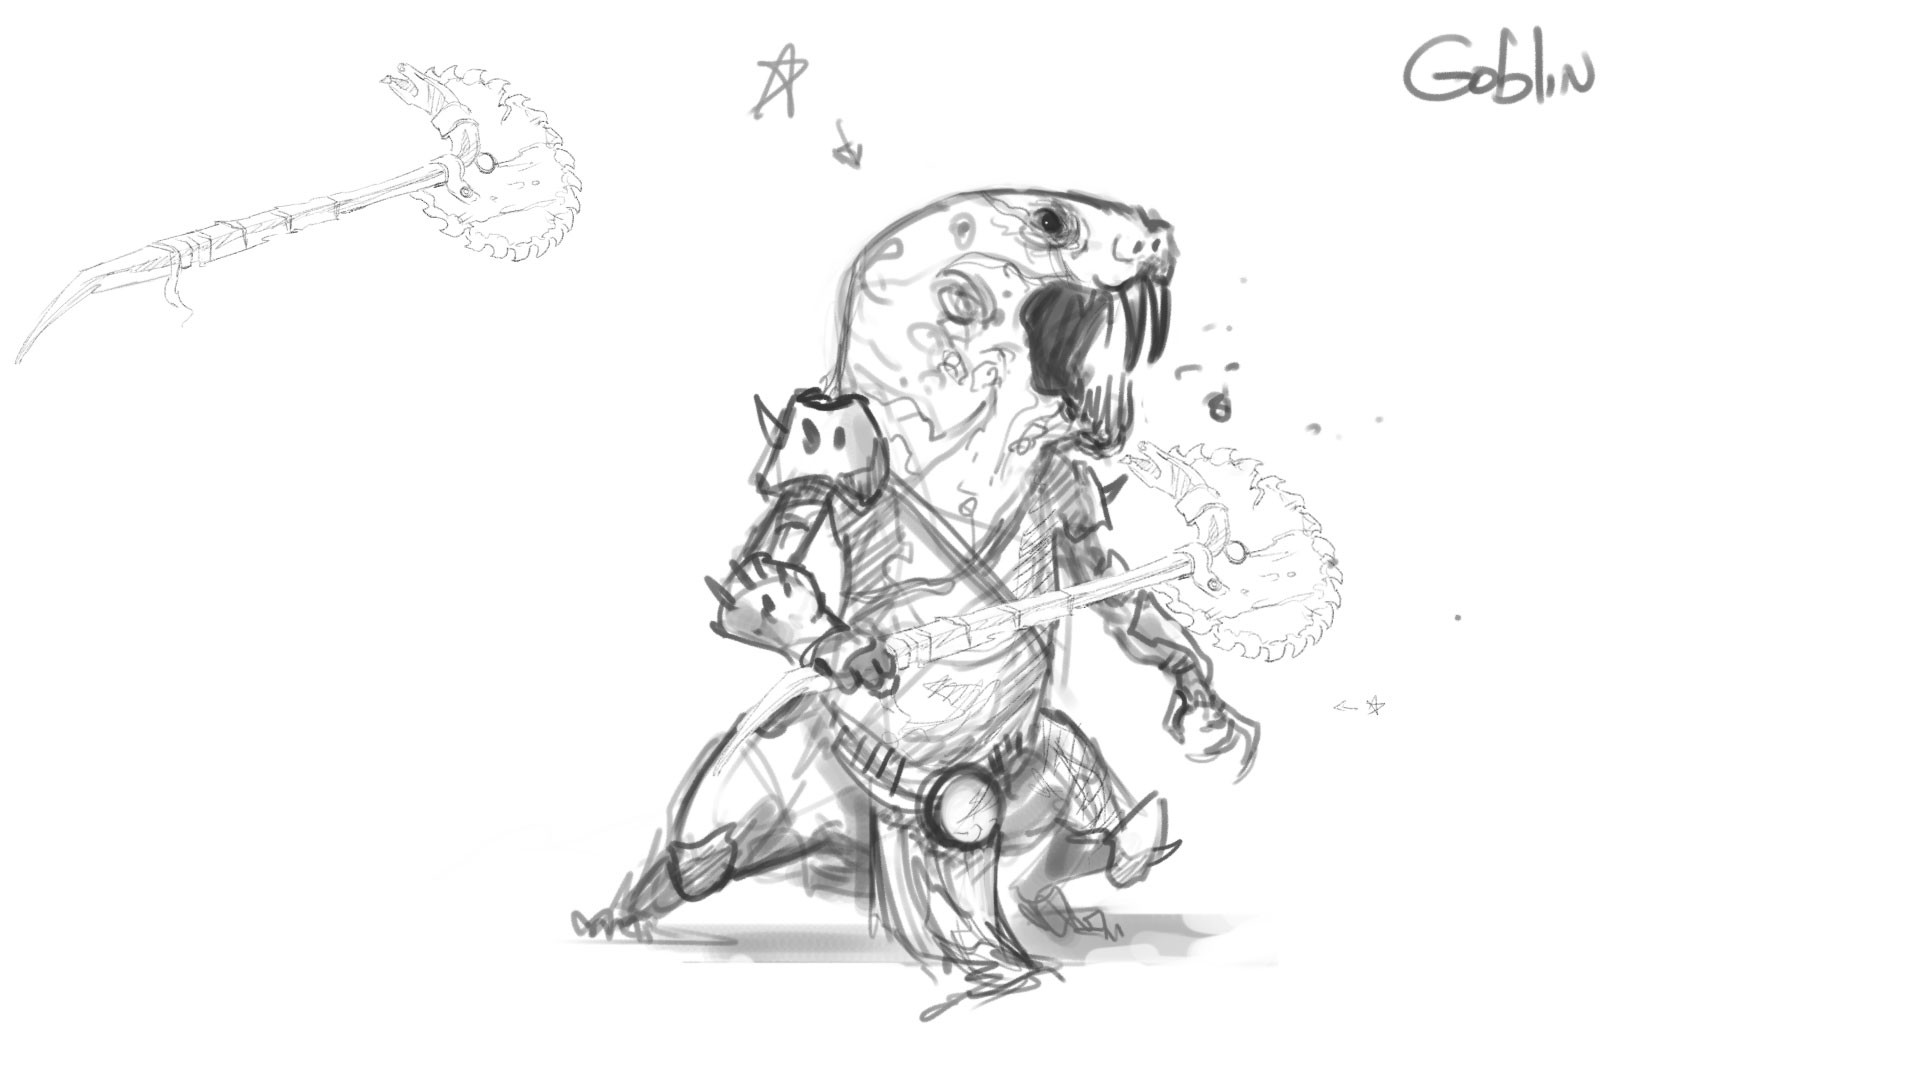 Michael rookard bestiary goblin1